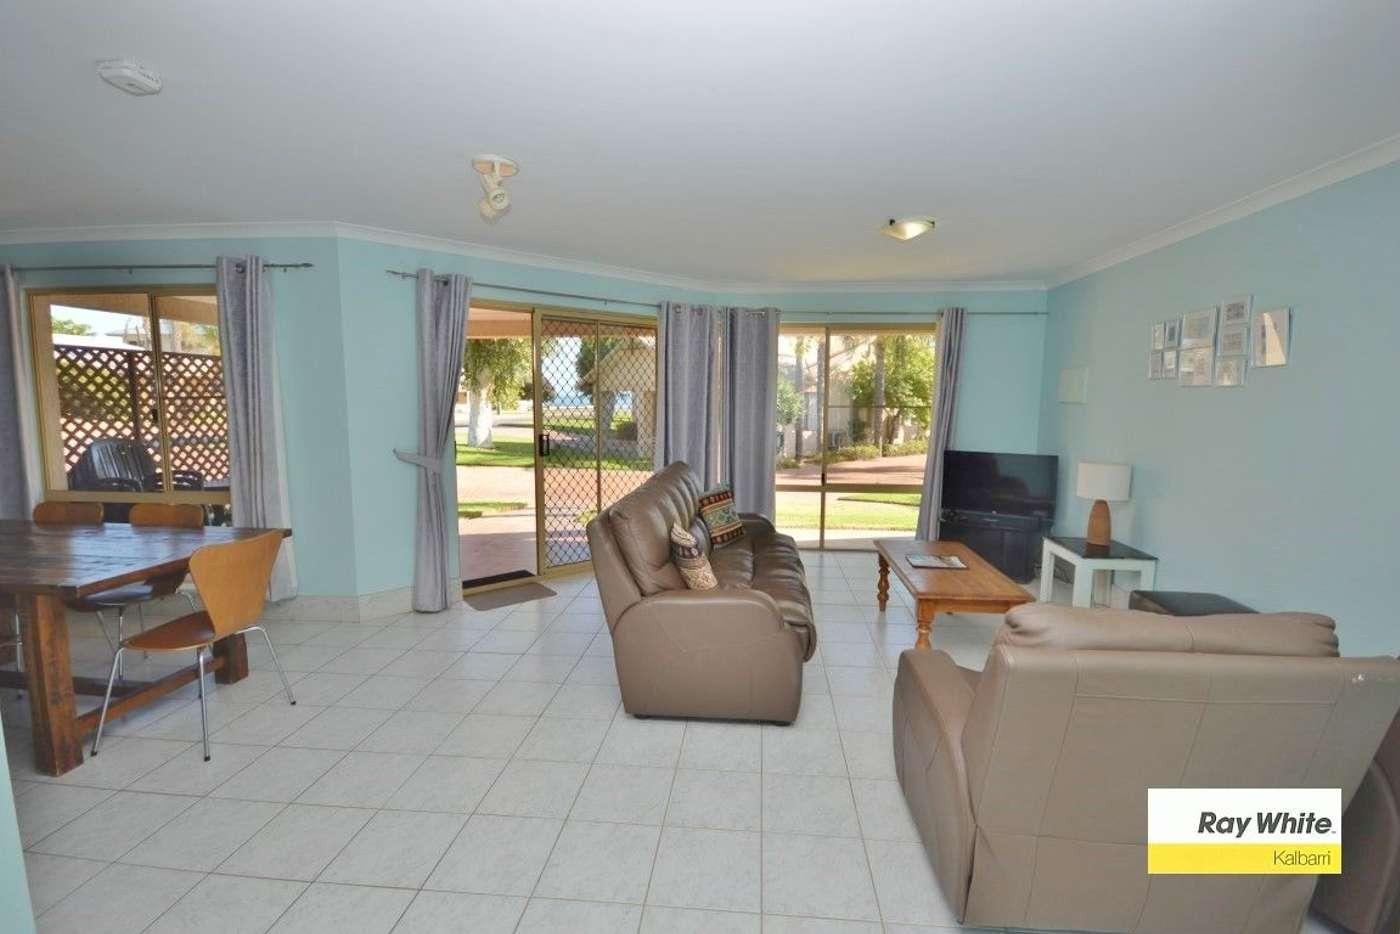 Seventh view of Homely unit listing, 18/22 Grey Street - Pelican Shore Villas, Kalbarri WA 6536